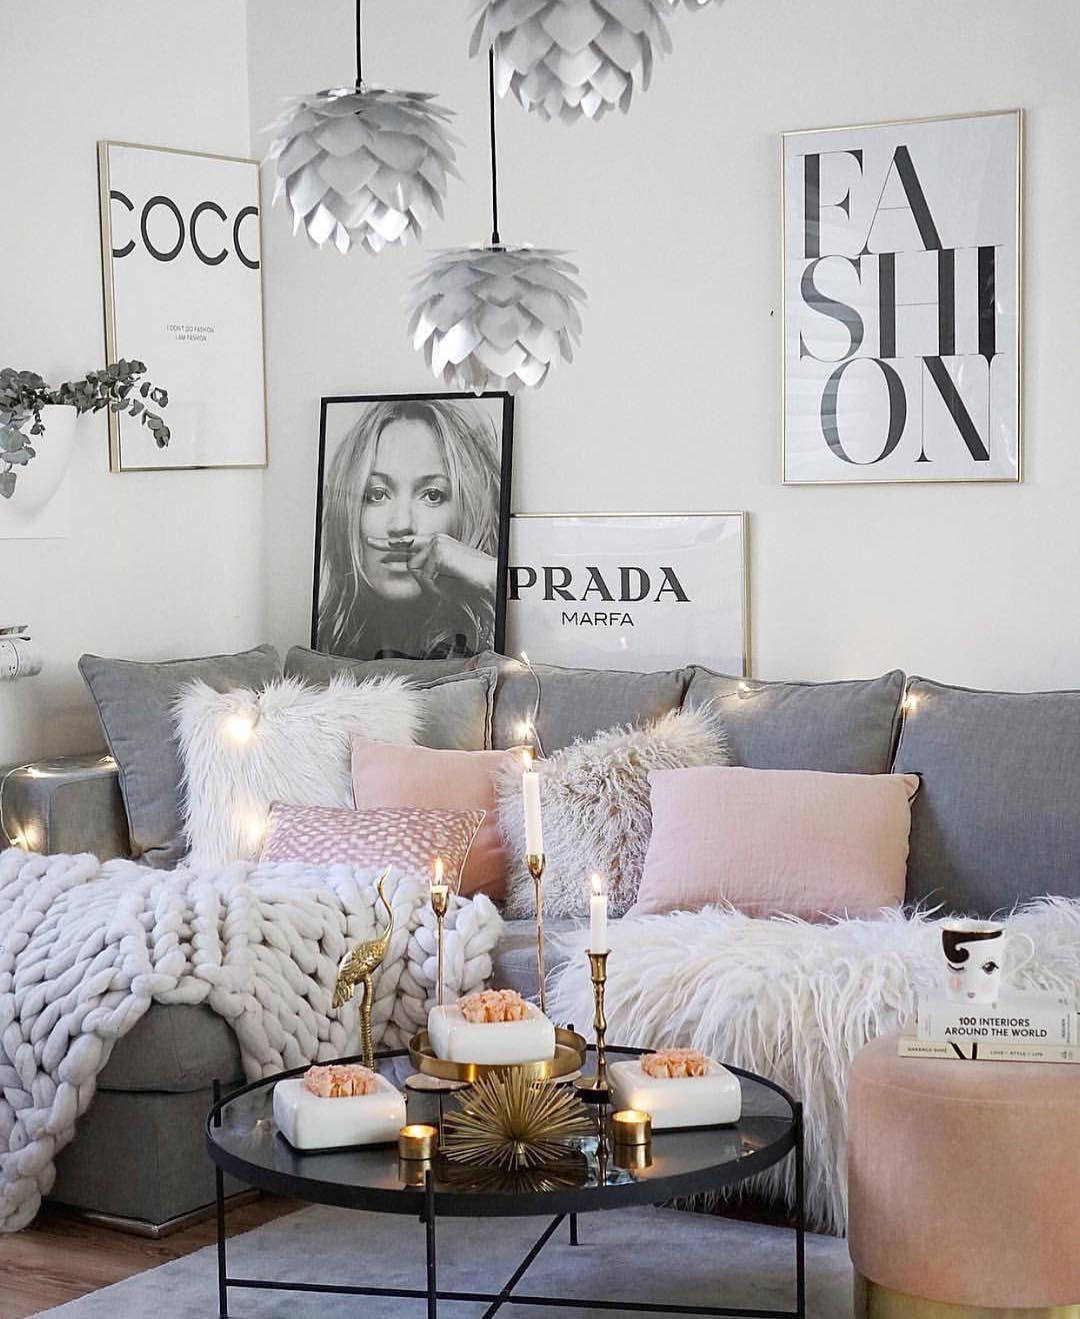 pingenta on house interior  living room decor